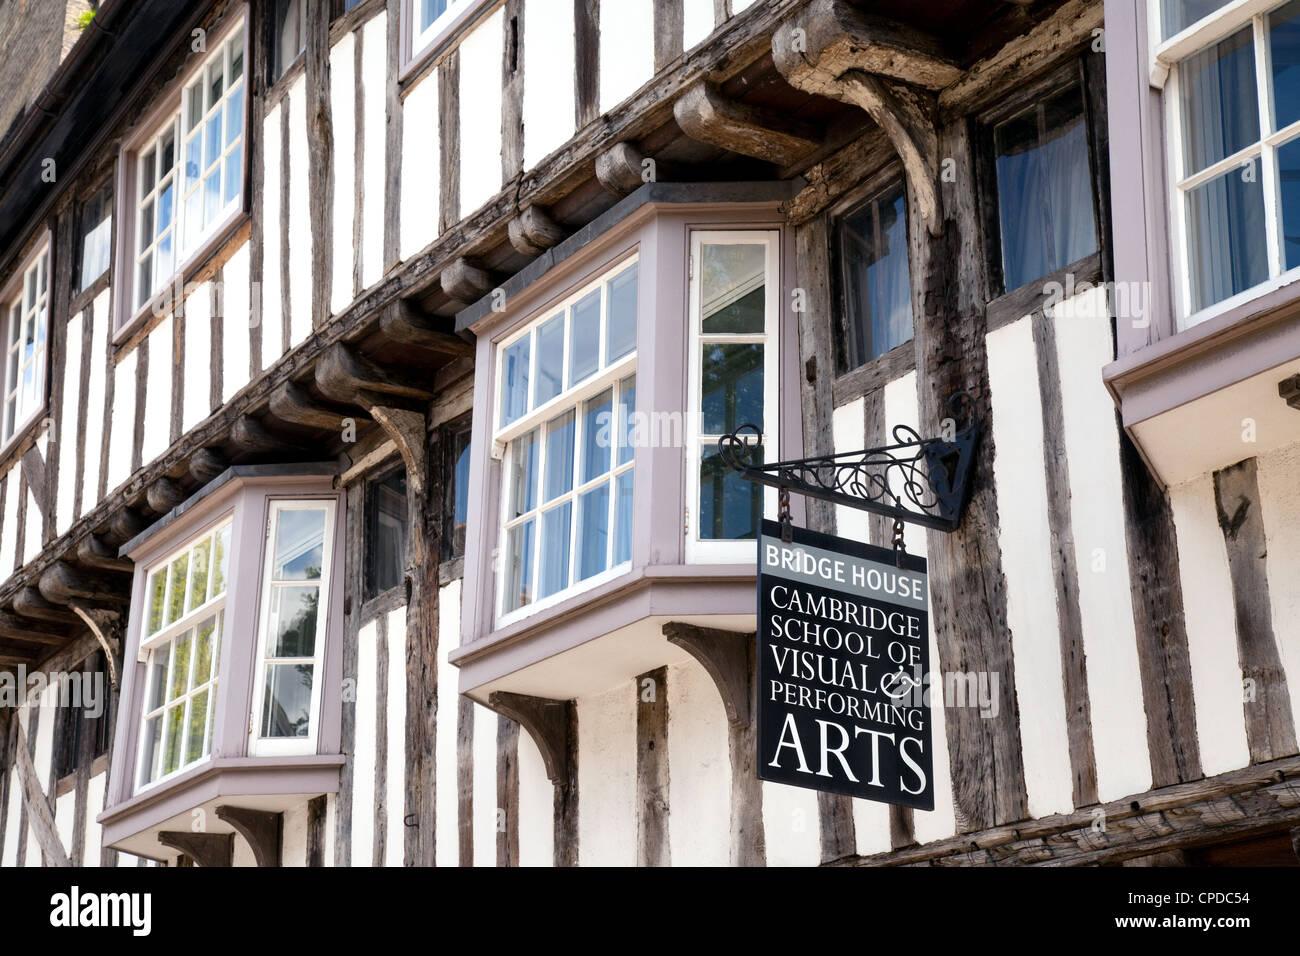 Bridge House, a medieval tudor building on Bridge St, Cambridge UK - Stock Image